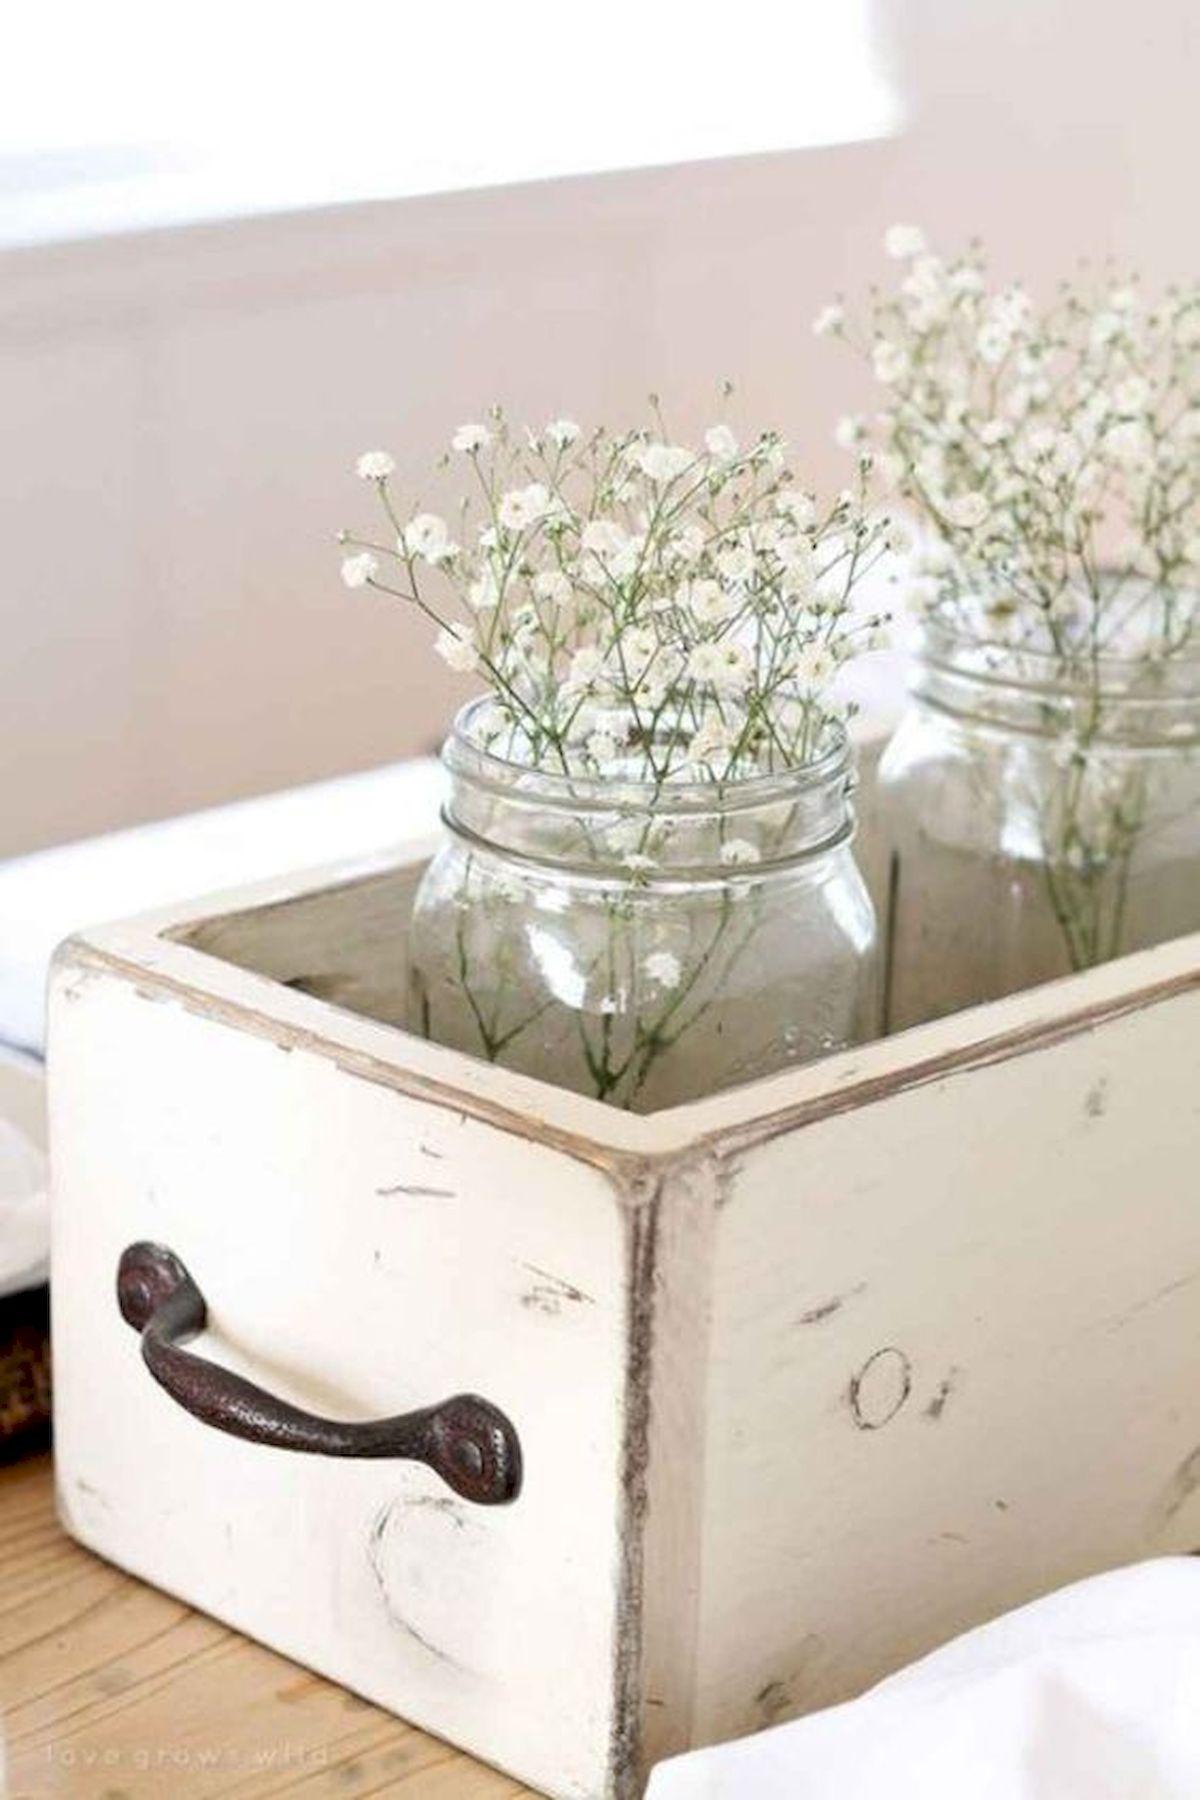 55 Inspiring DIY Farmhouse Decor Ideas On A Budget (33)